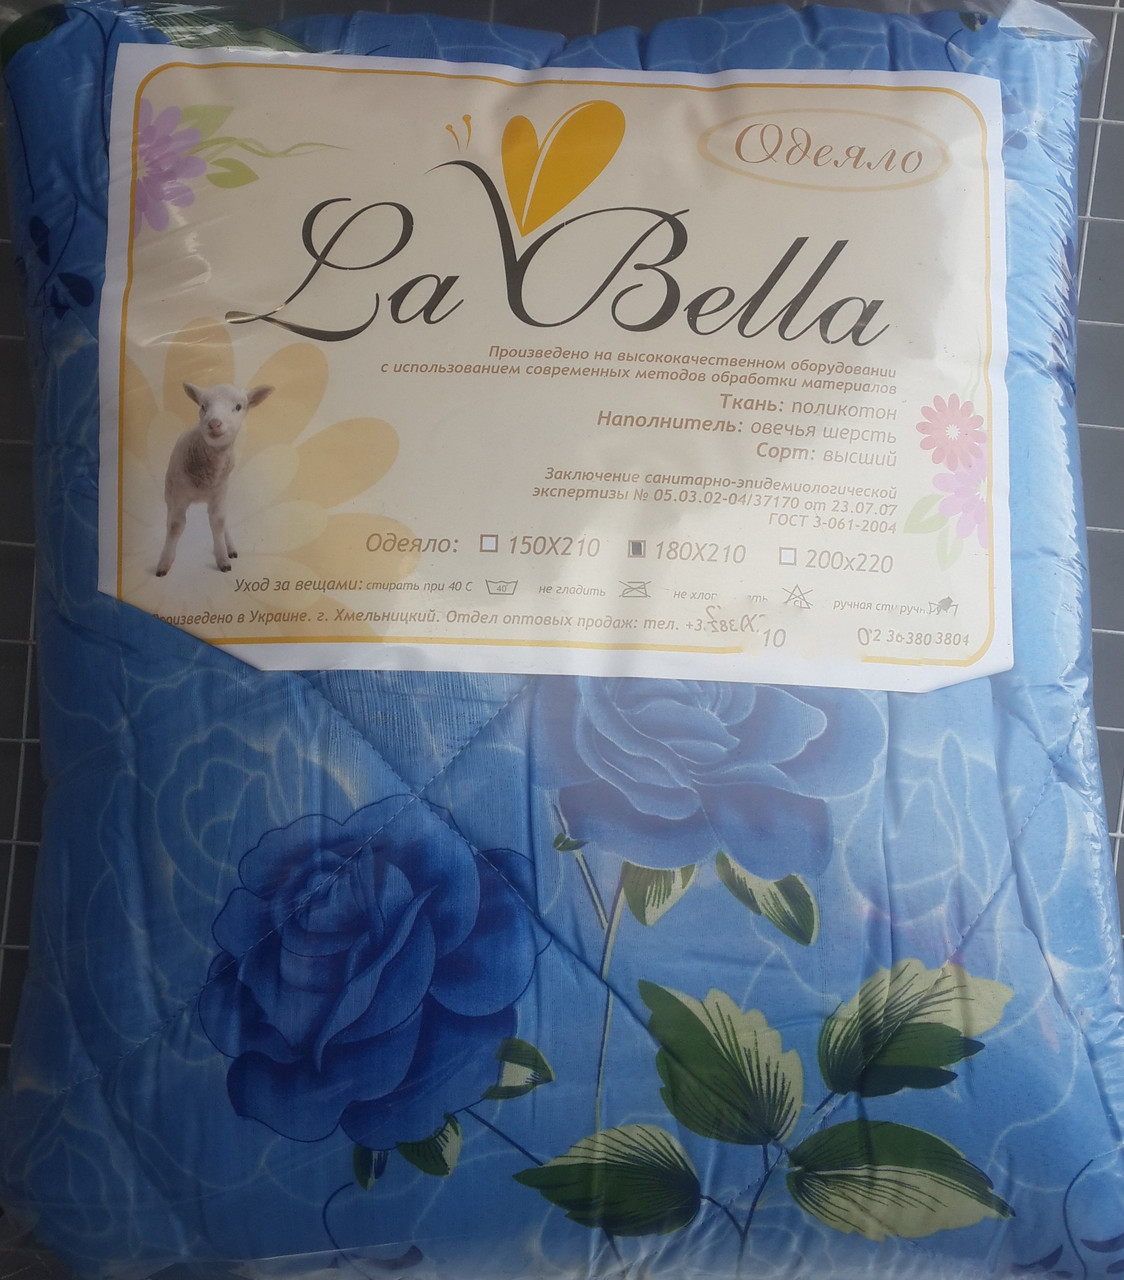 Теплое одеяло на овчине полуторное La Bella в асортименте